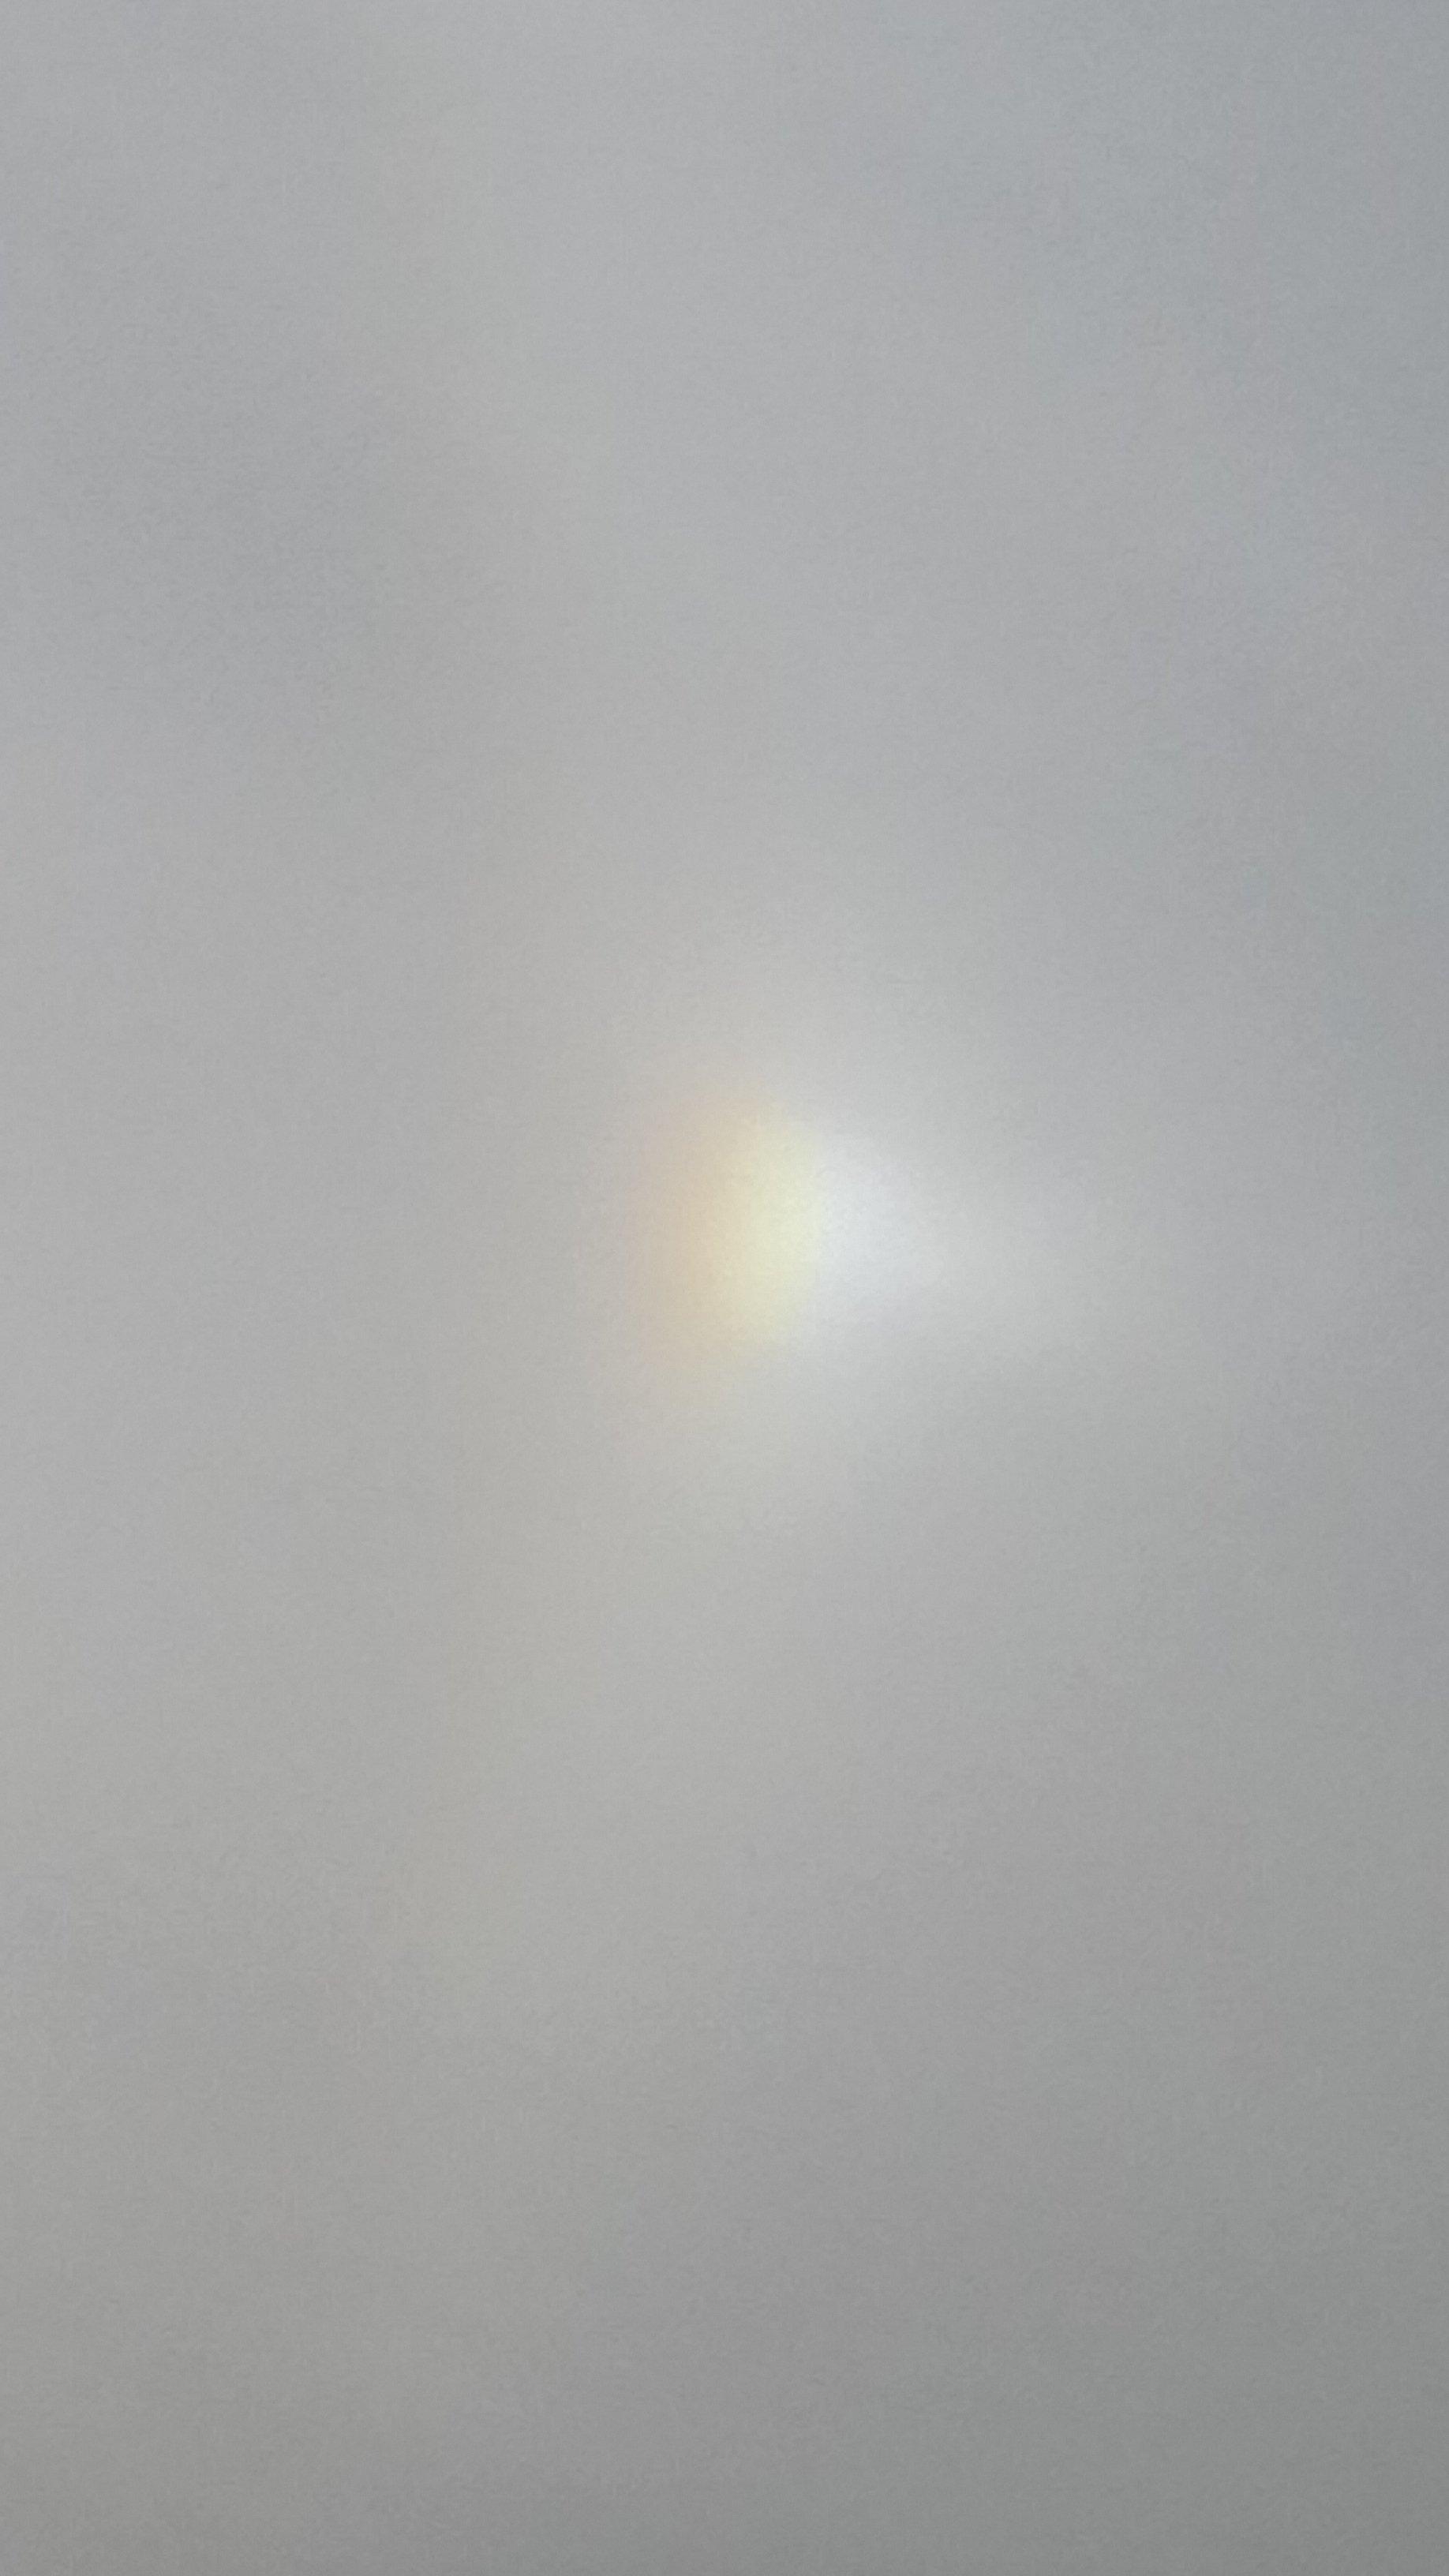 2020 Sundog 2 May 21.jpg